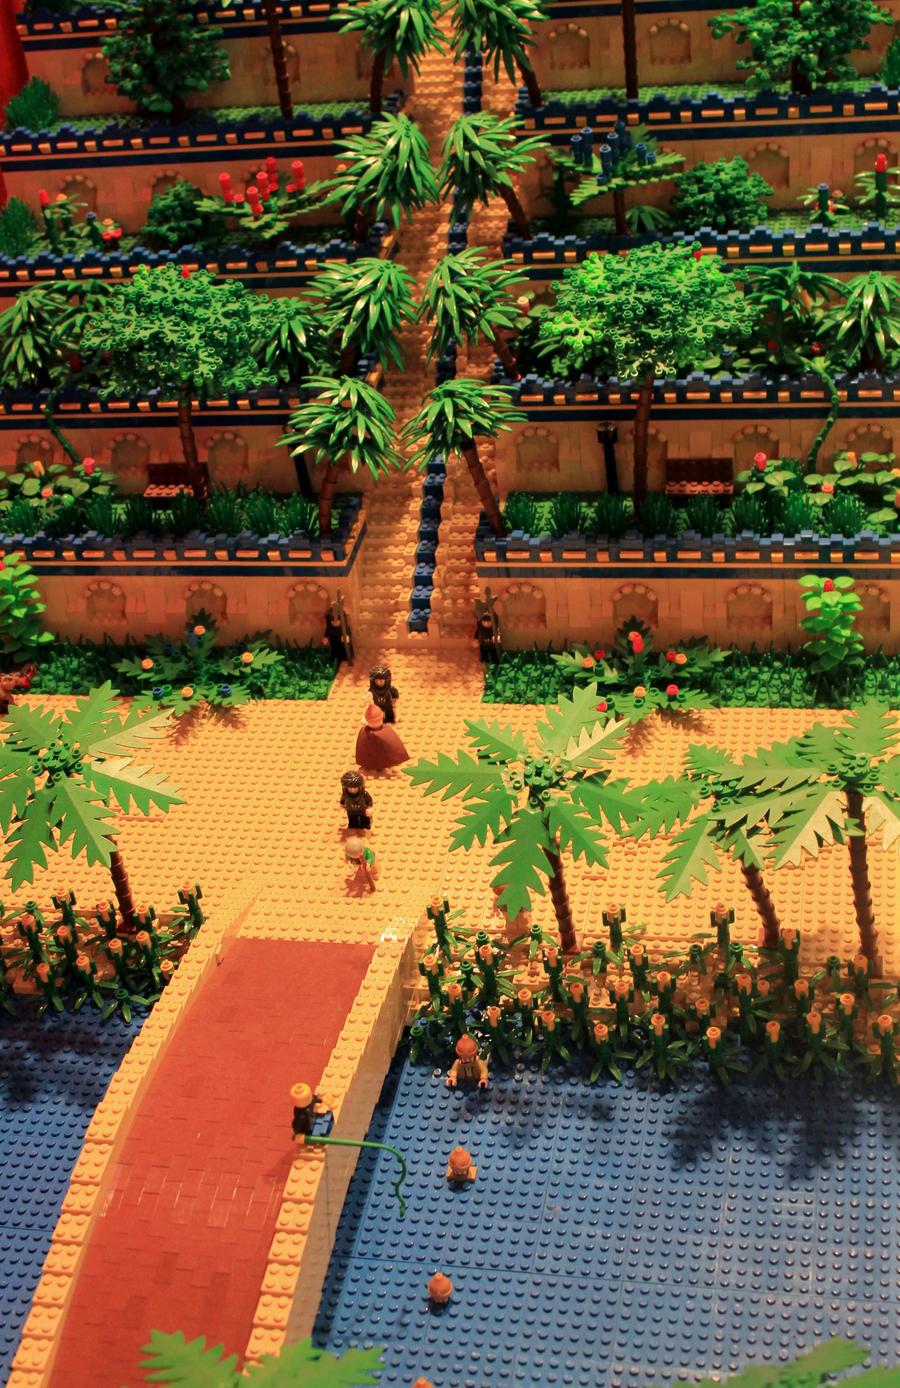 Hanging gardens of Babylon by randomshooting